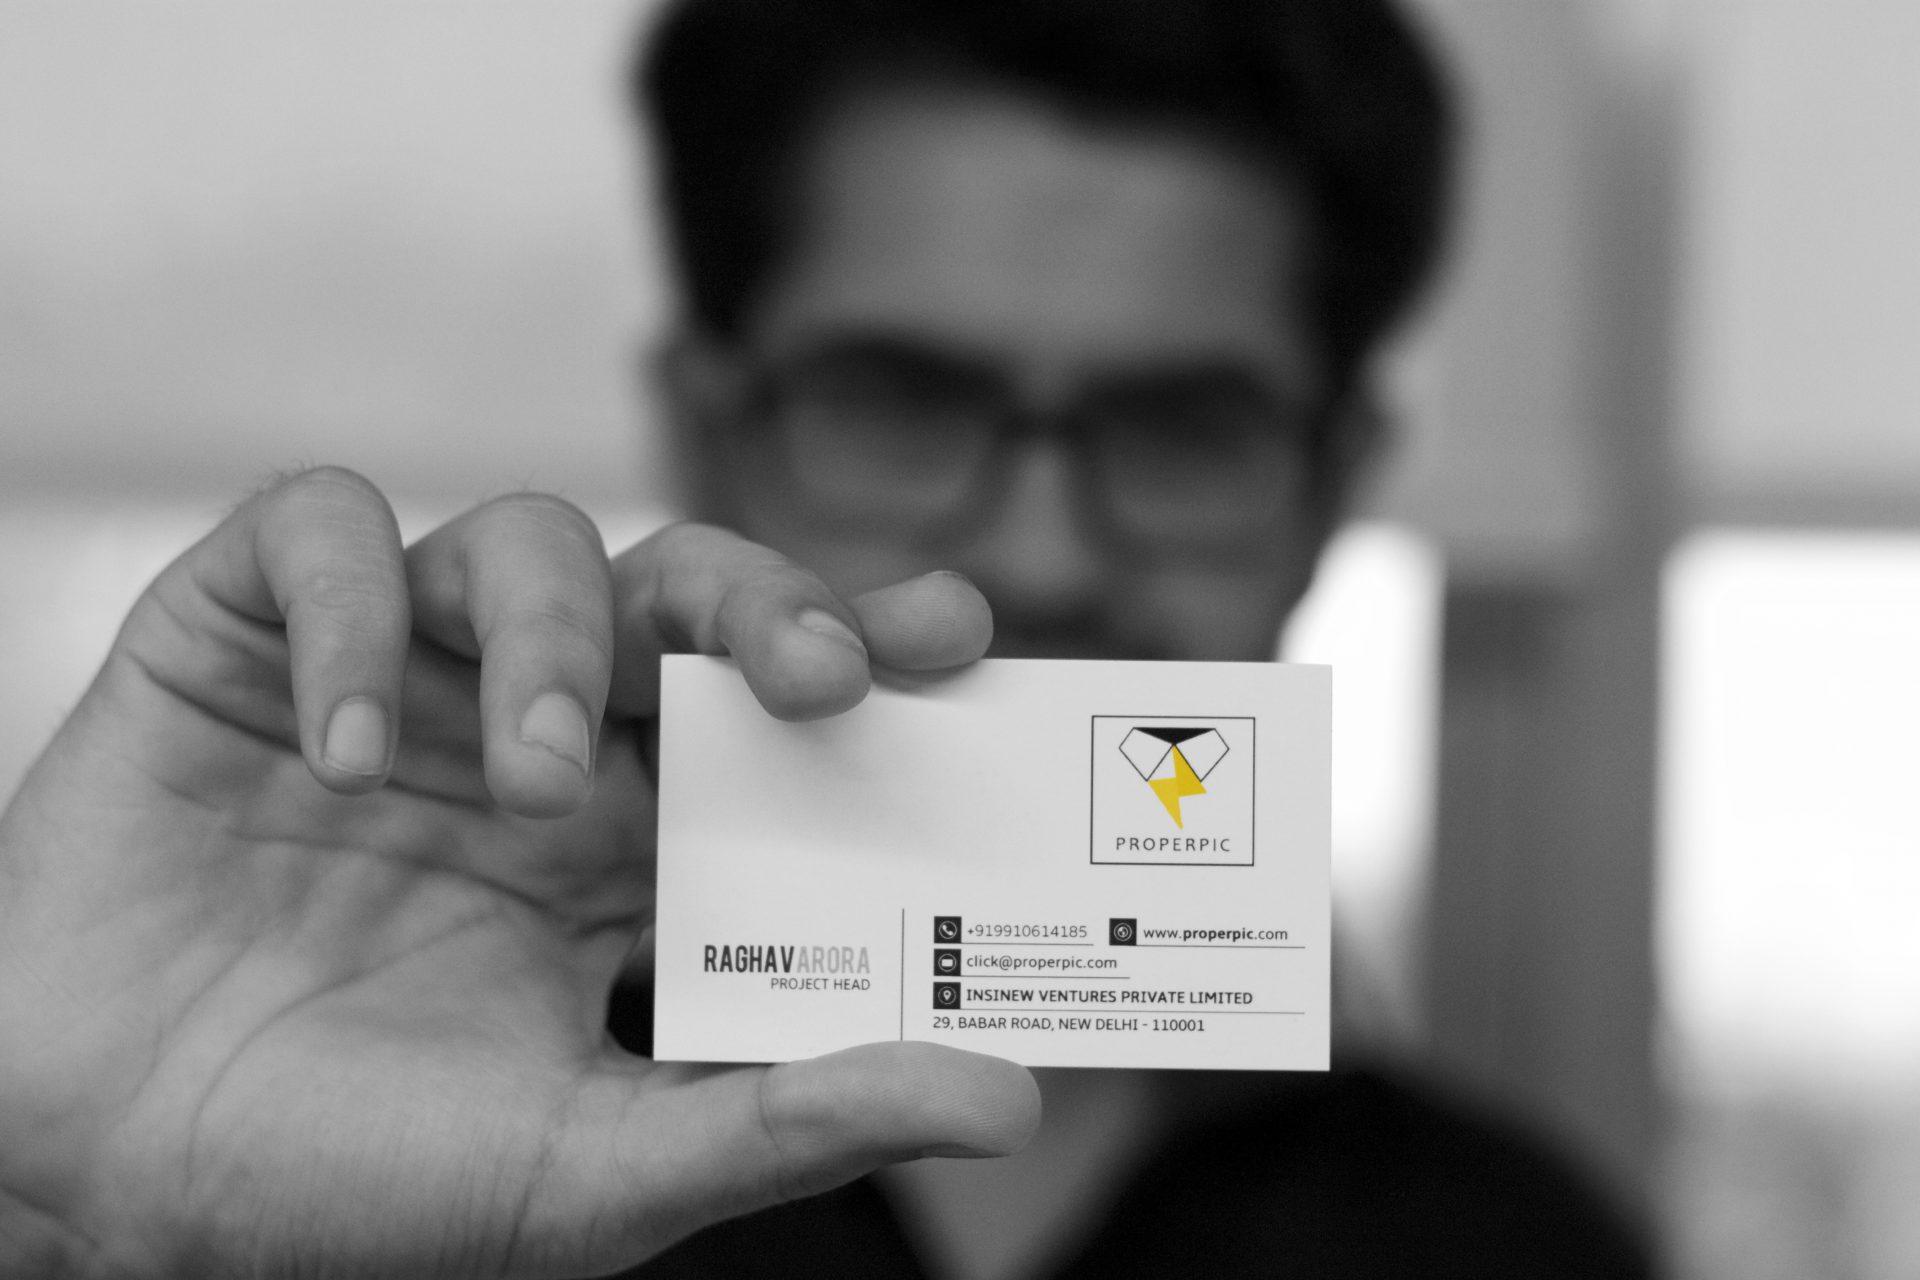 a-marketing-internship-done-right-raghav-arora-iitm